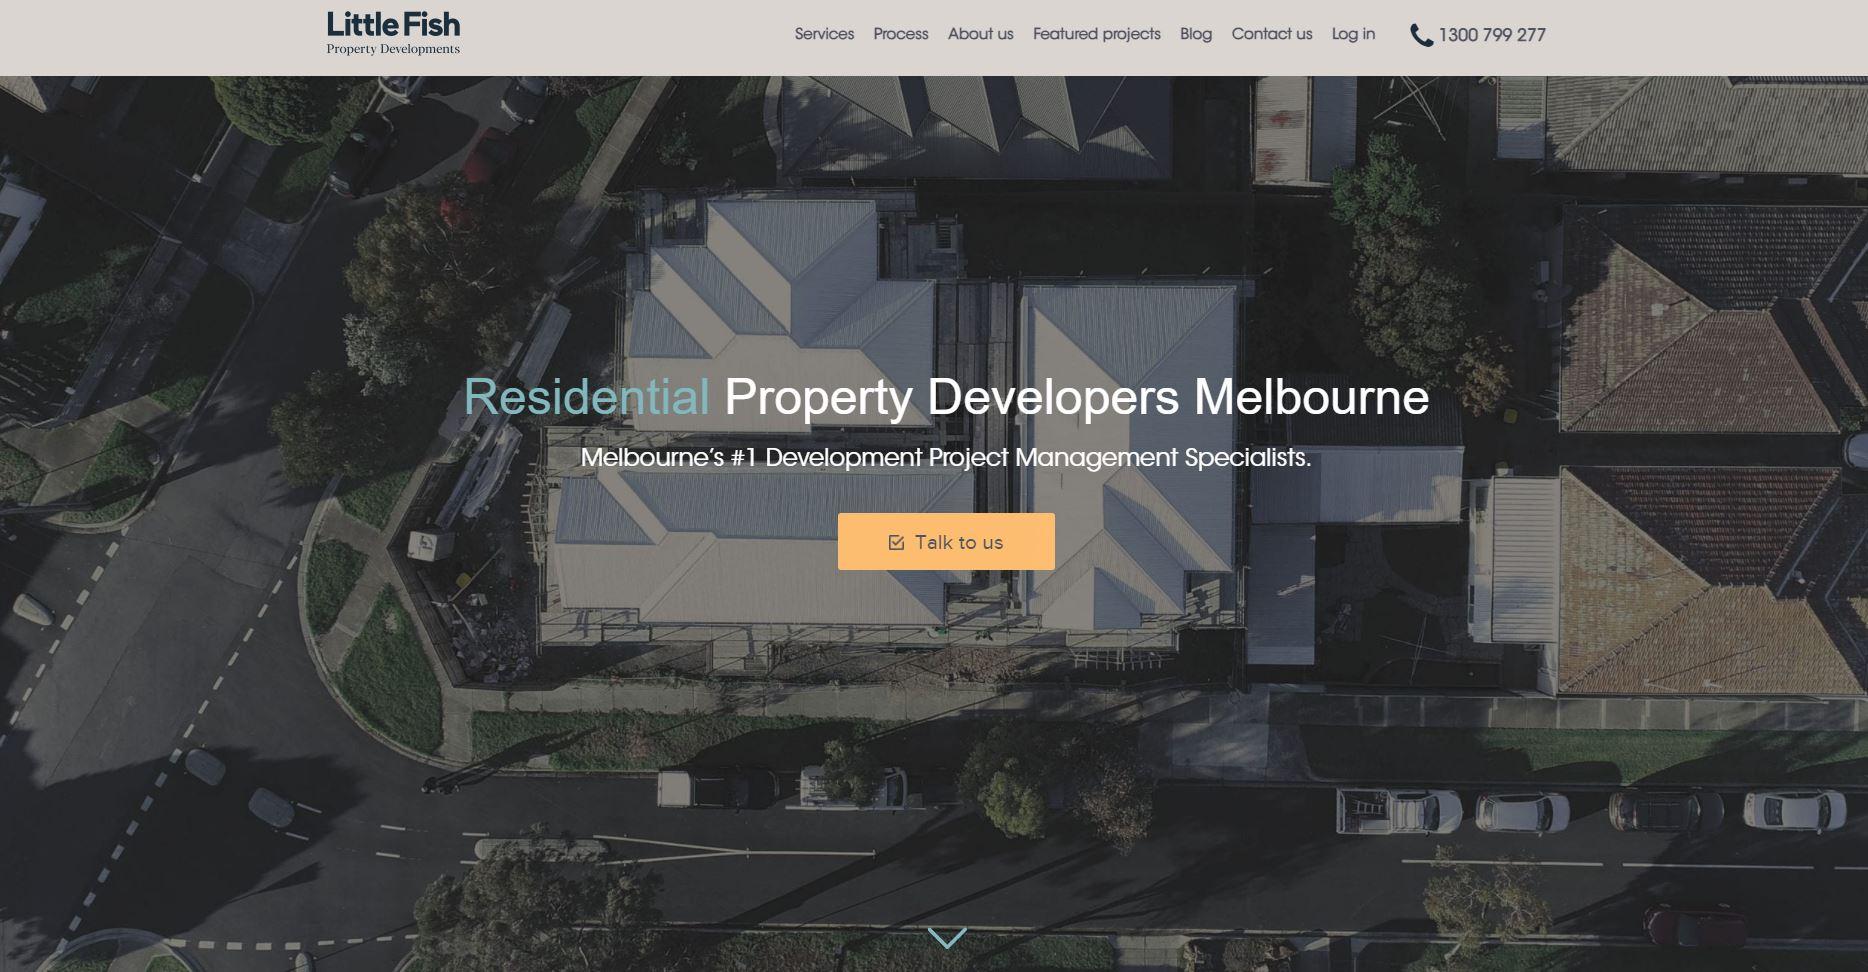 Little Fish Property Developments